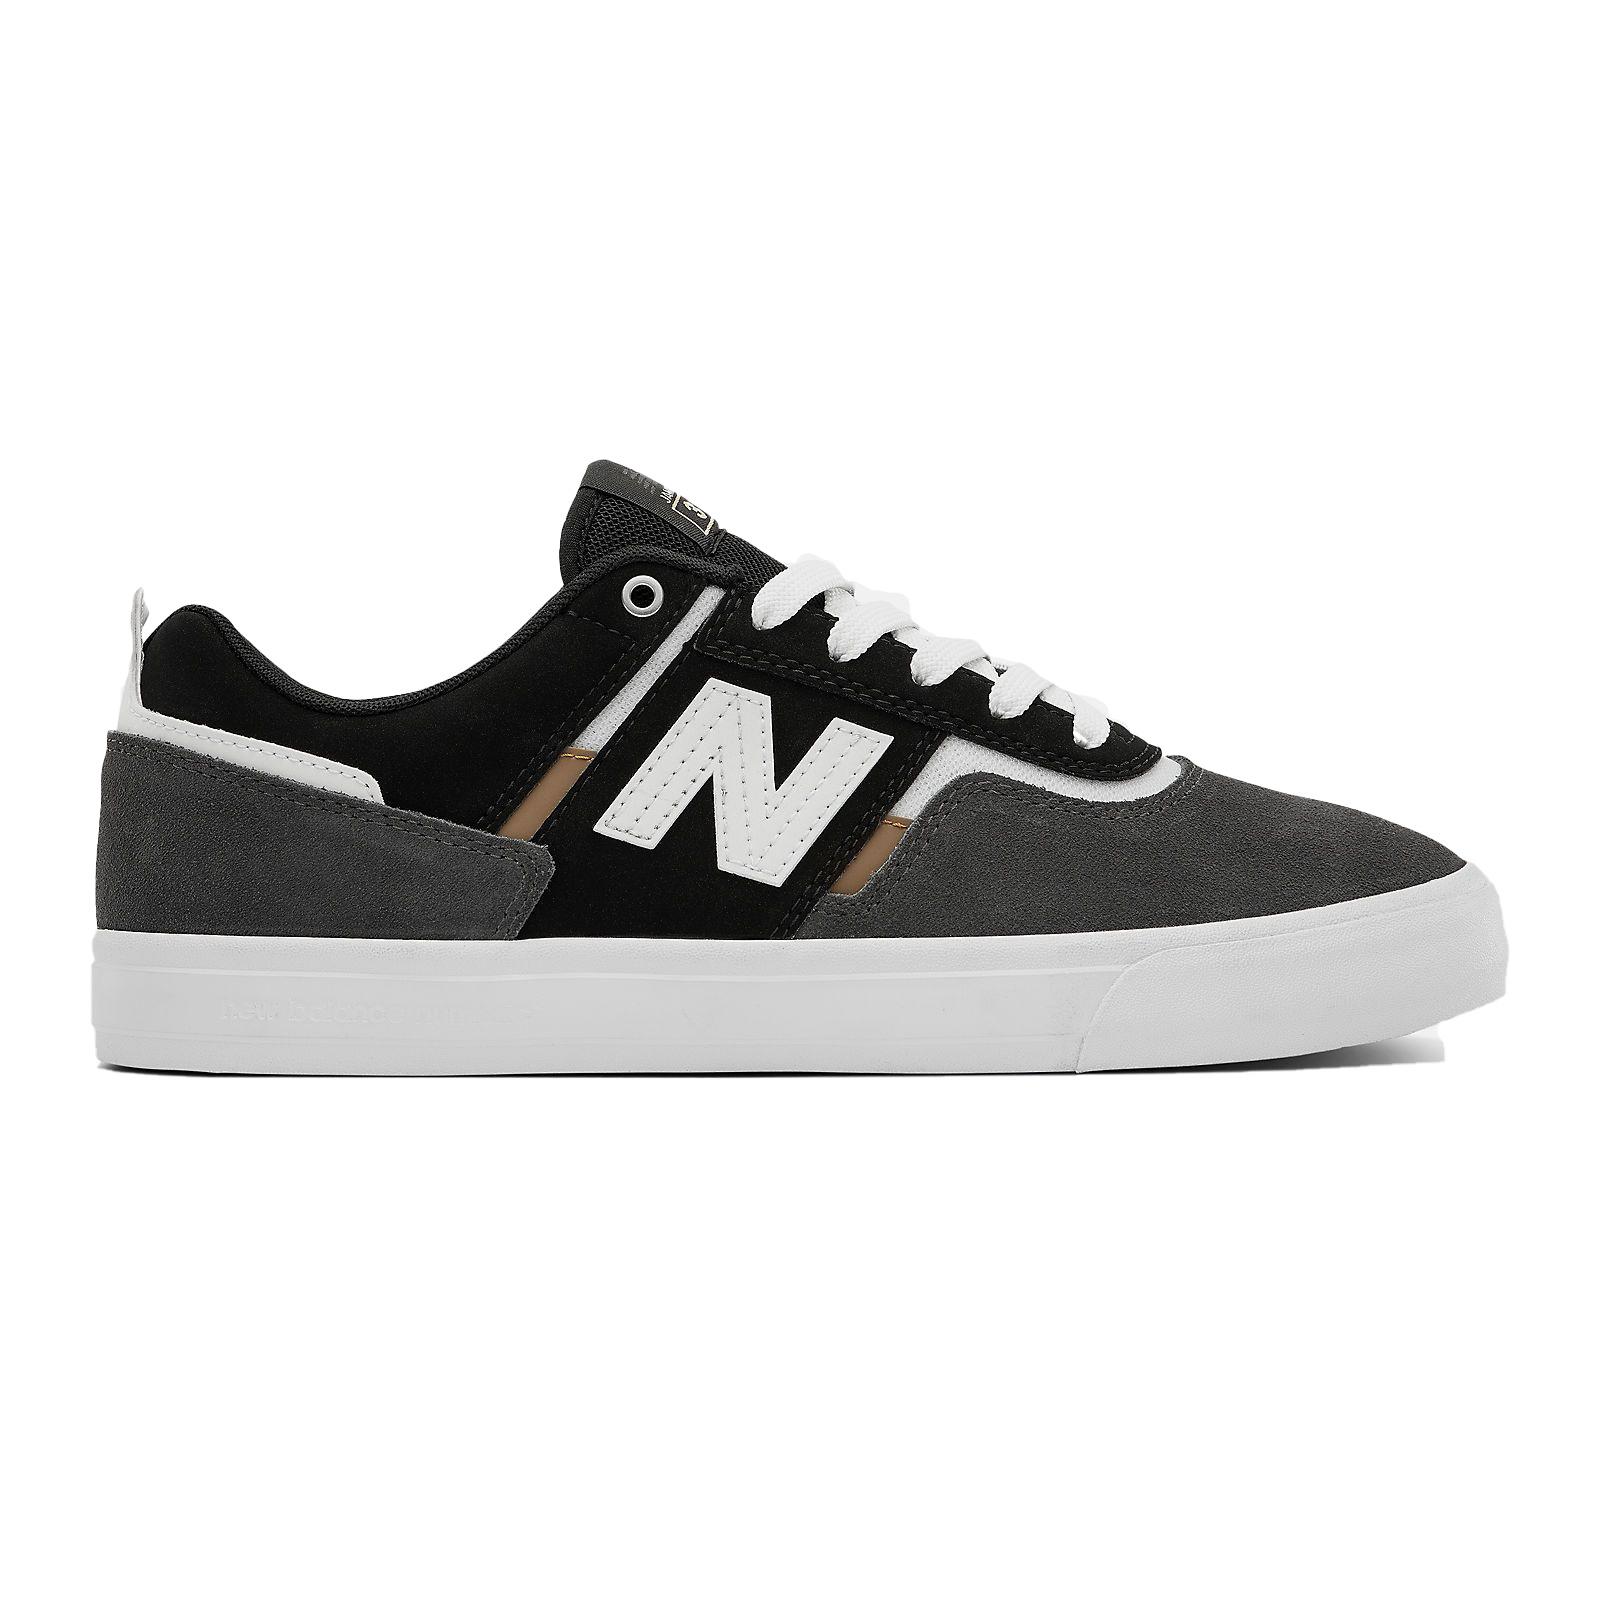 NB NUMERIC NB NUMERIC FOY 306 GREY / BLACK